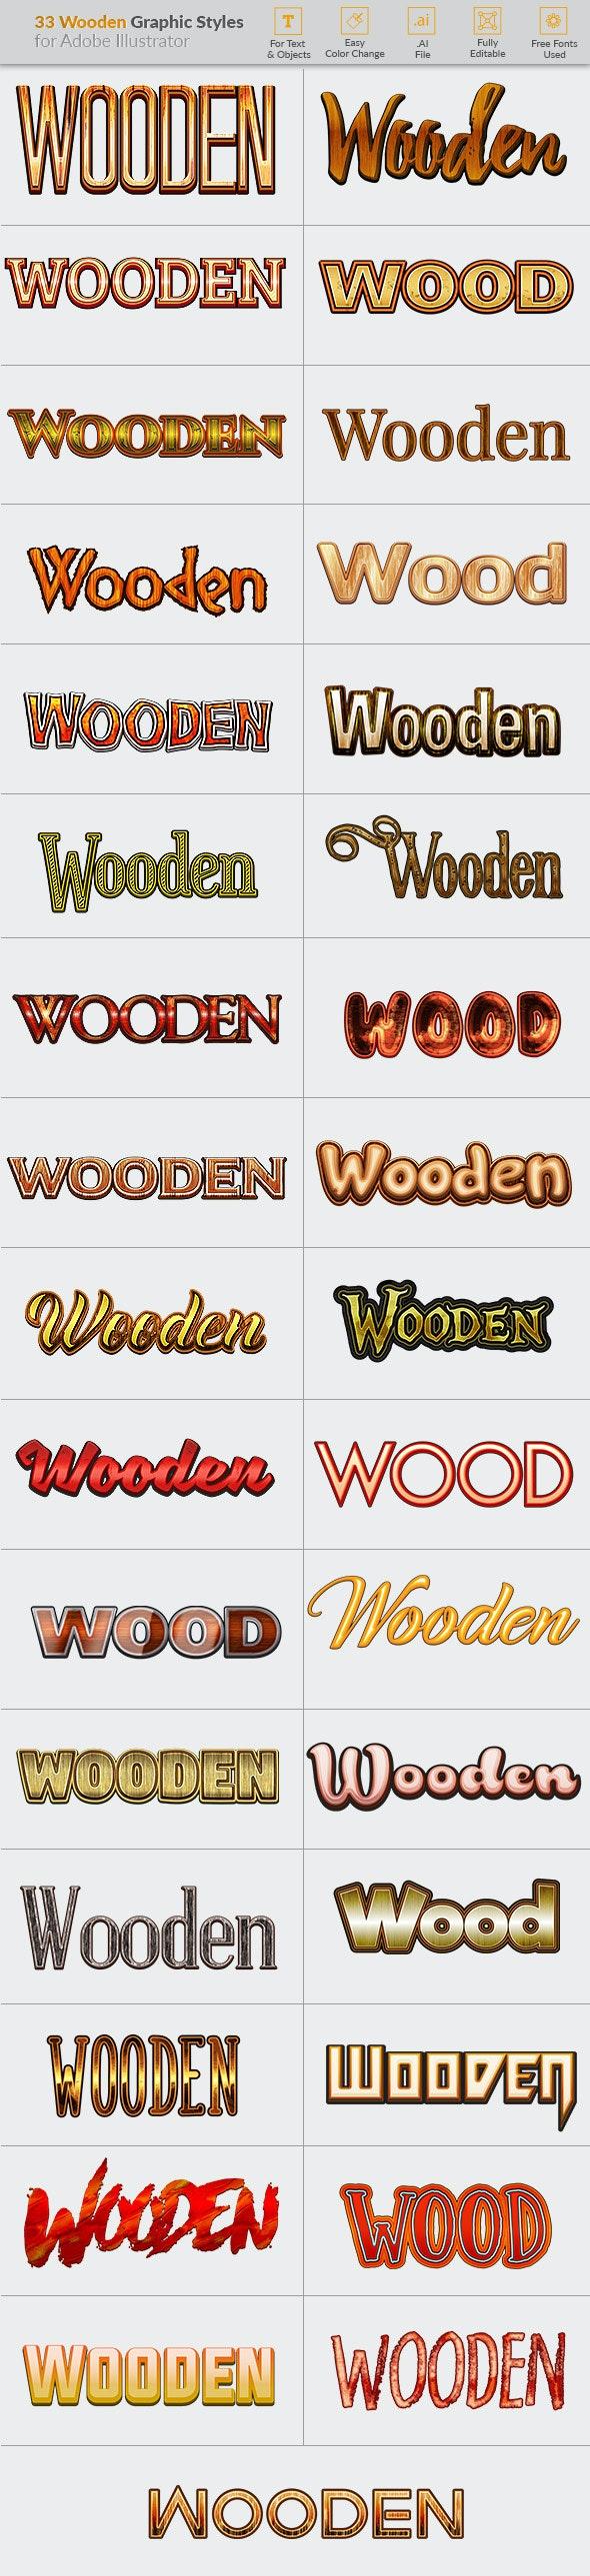 33 Wooden Graphic Styles for Illustrator - Styles Illustrator